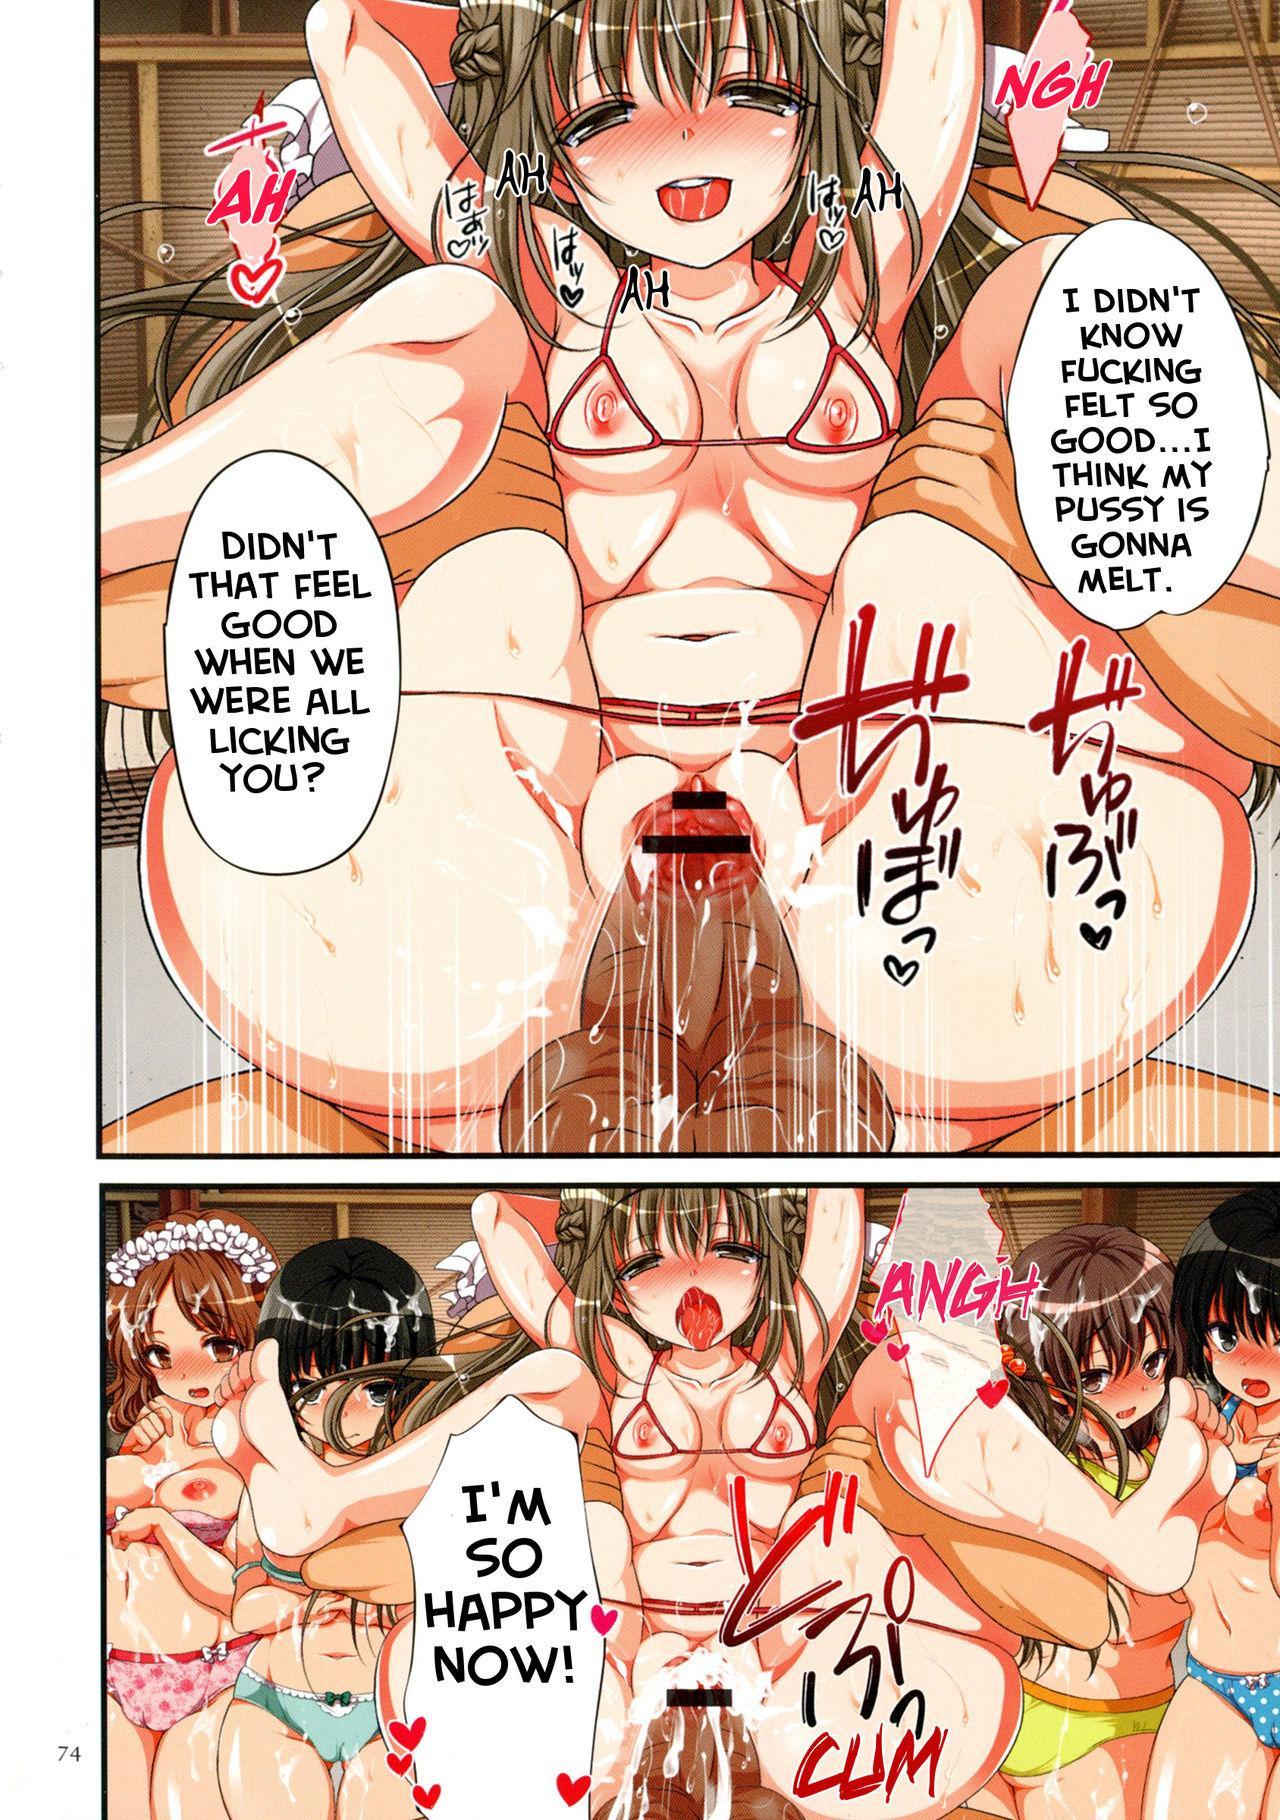 Kyousei Haramase Gouhouka!!! Rape ga Gouhouka saretara Nippon wa dou Narimasu ka?   If Rape Were Legalized Ch. 2 29